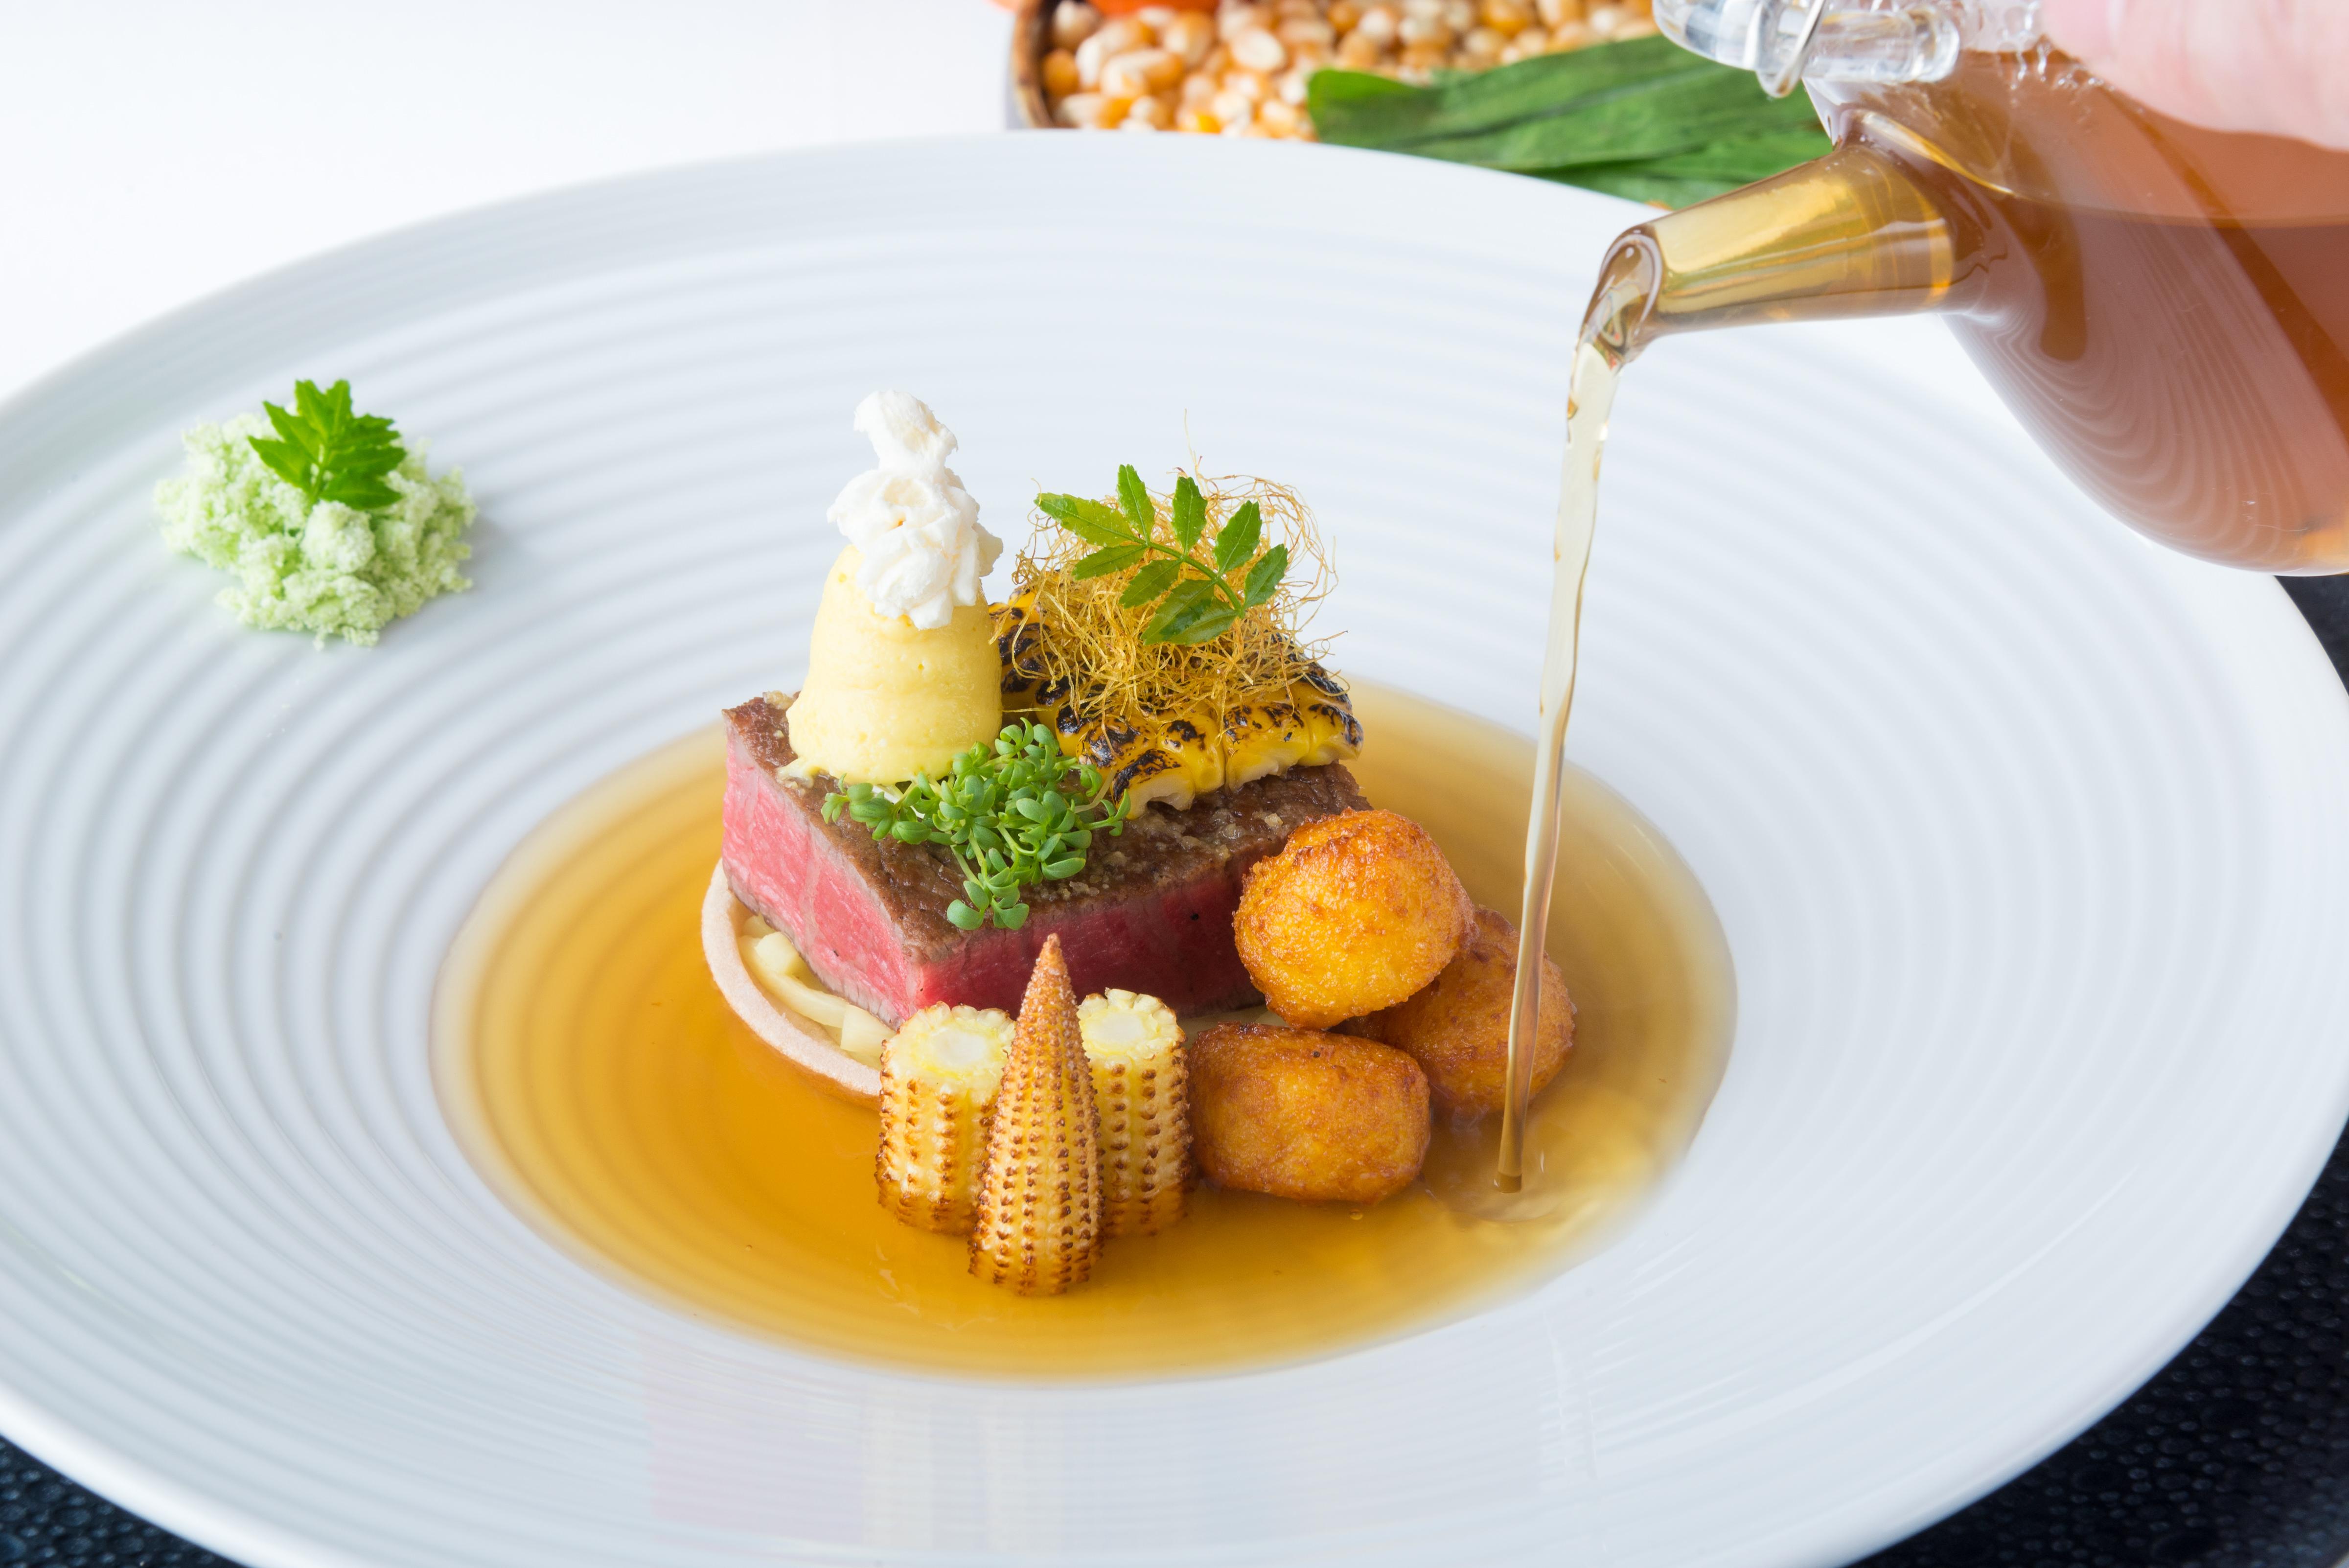 Nabeno-Ism cuisine